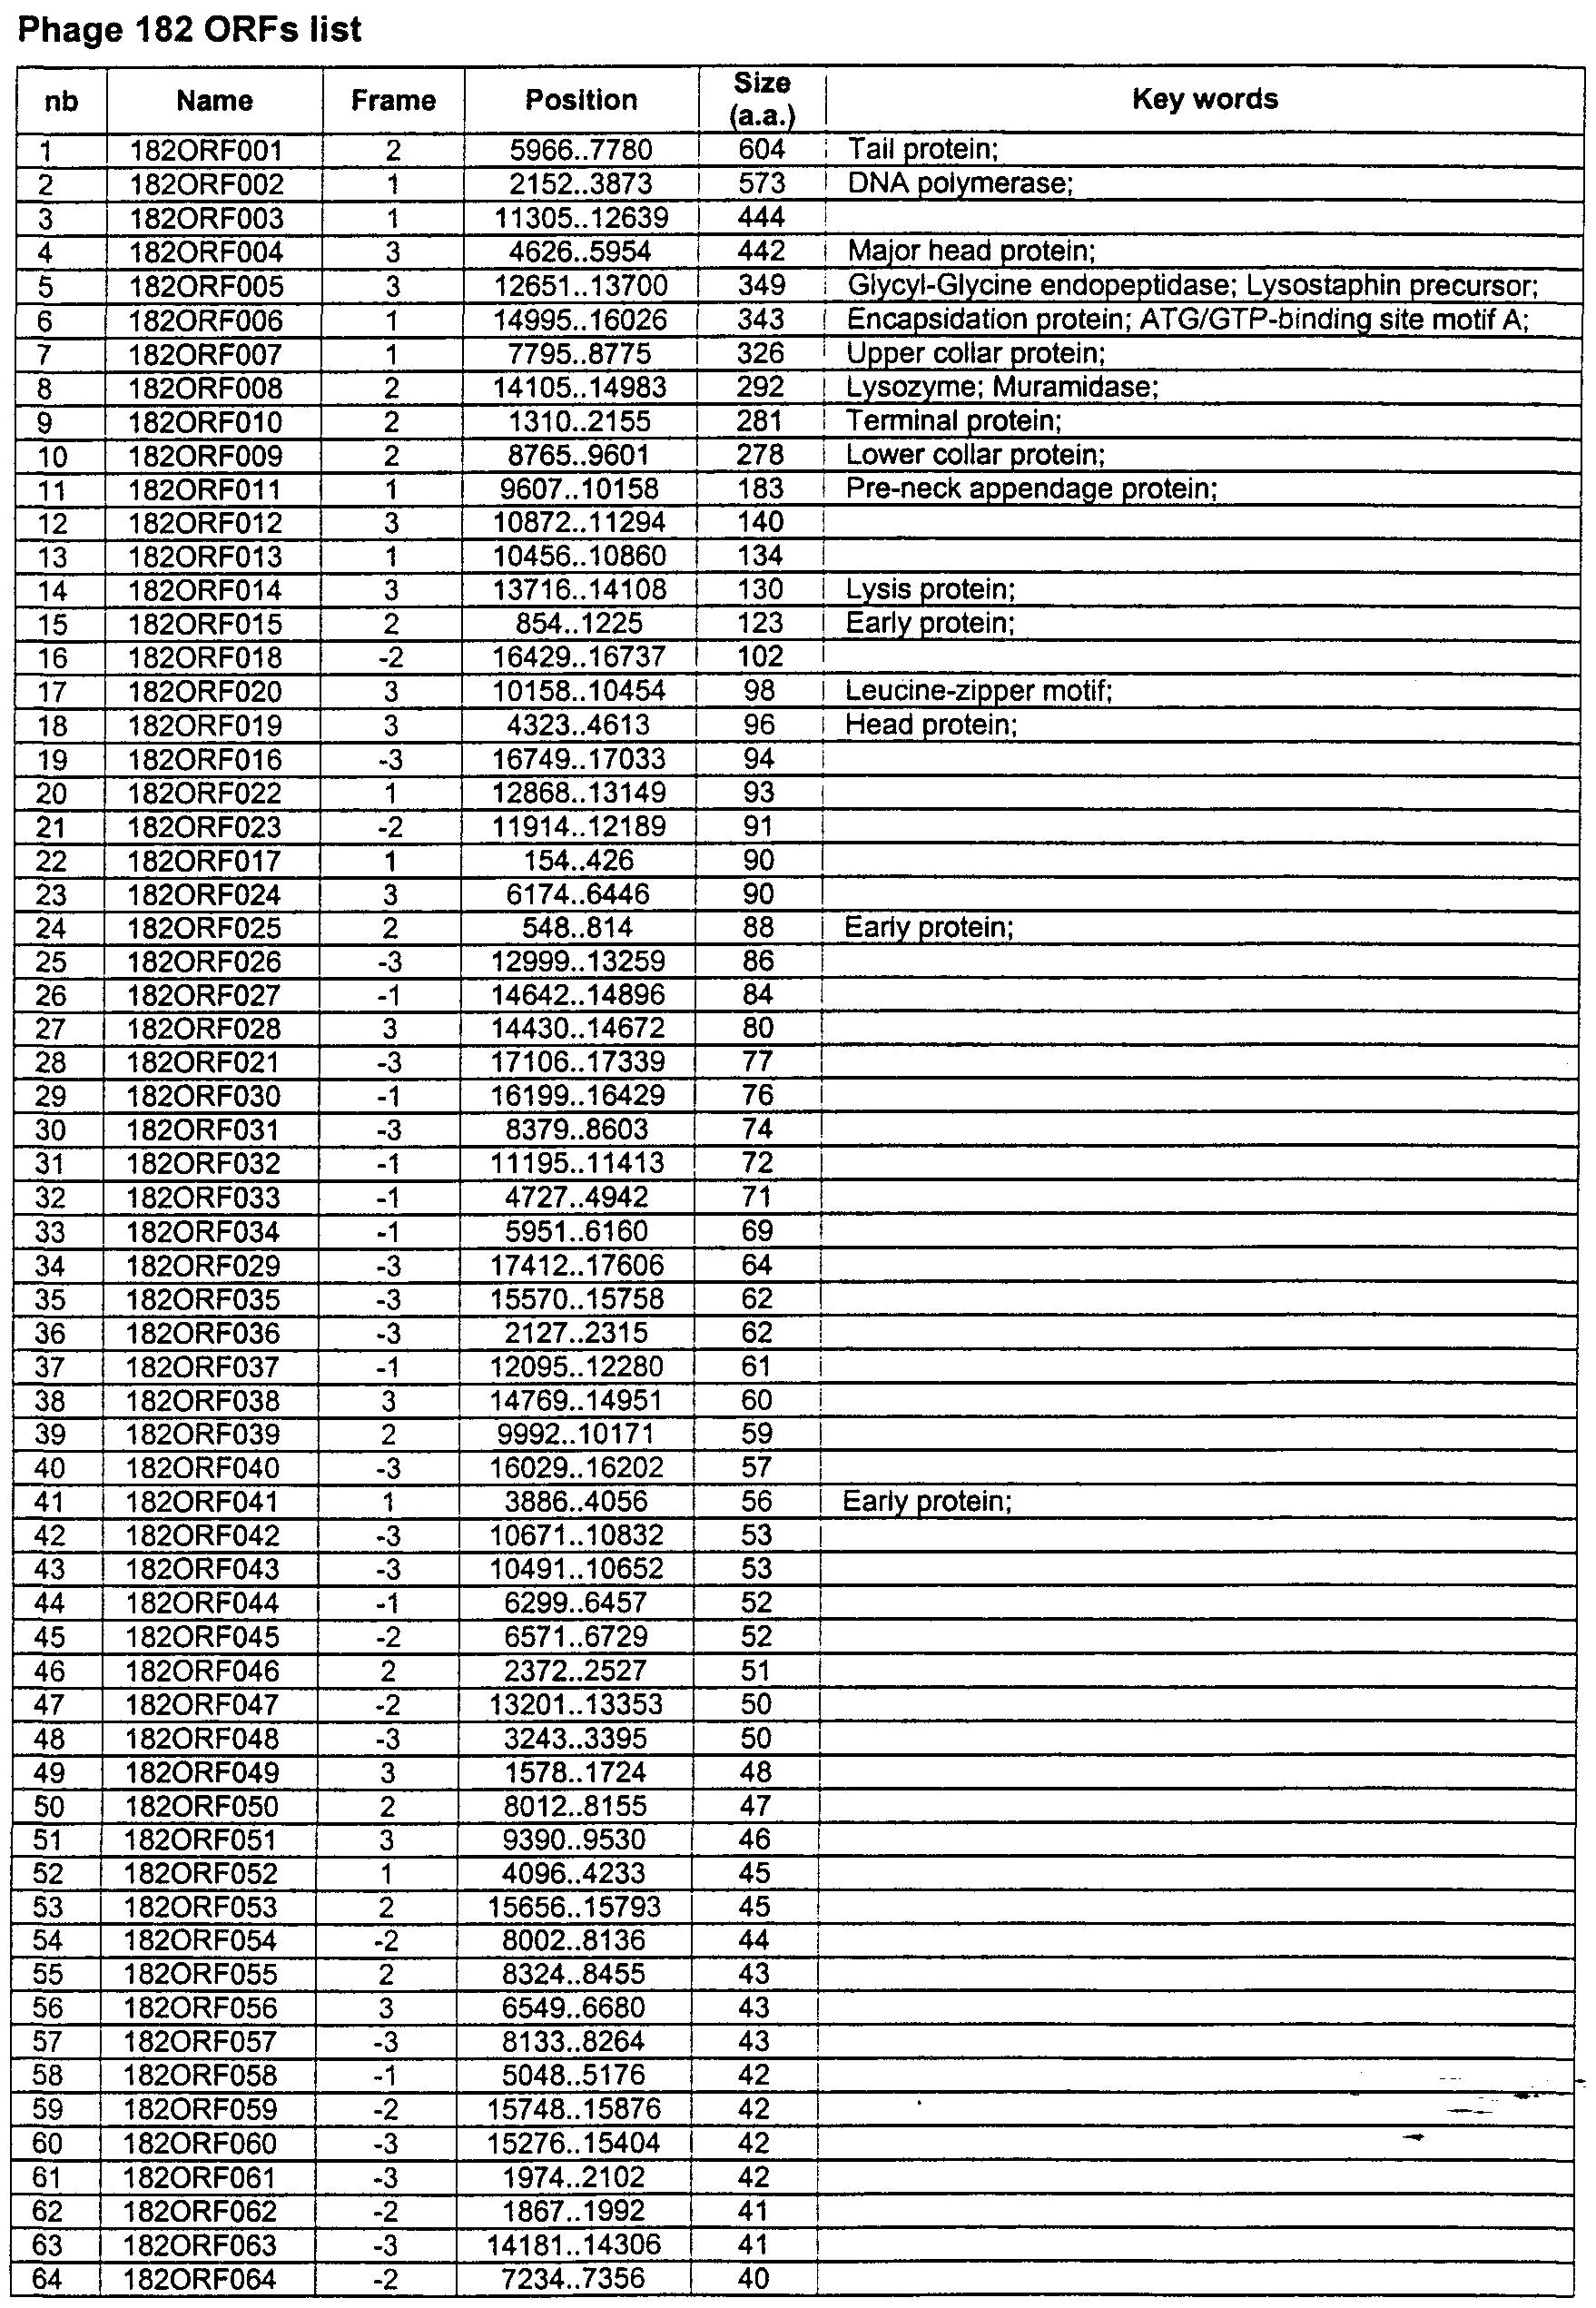 841GA 52 55